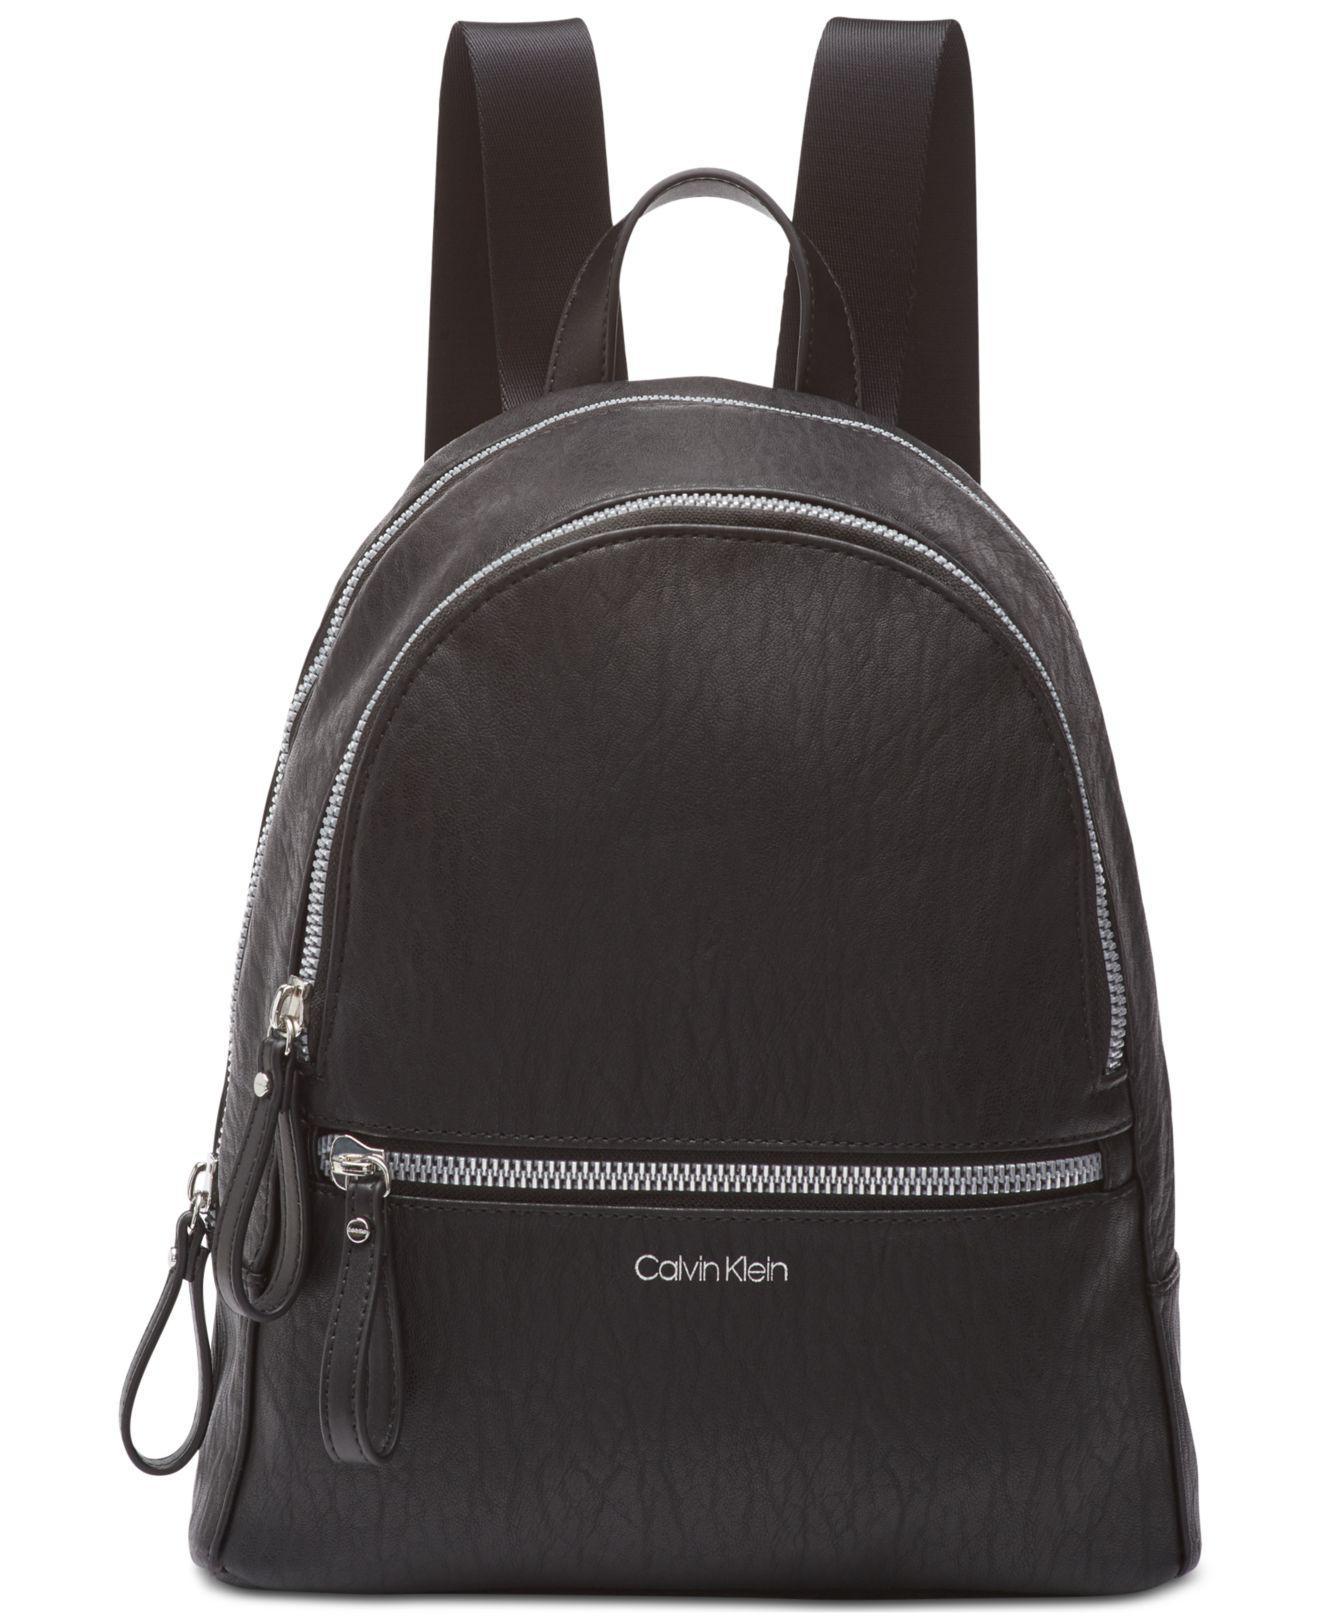 02c2c9afead0 Calvin Klein - Black Elaine Backpack - Lyst. View fullscreen